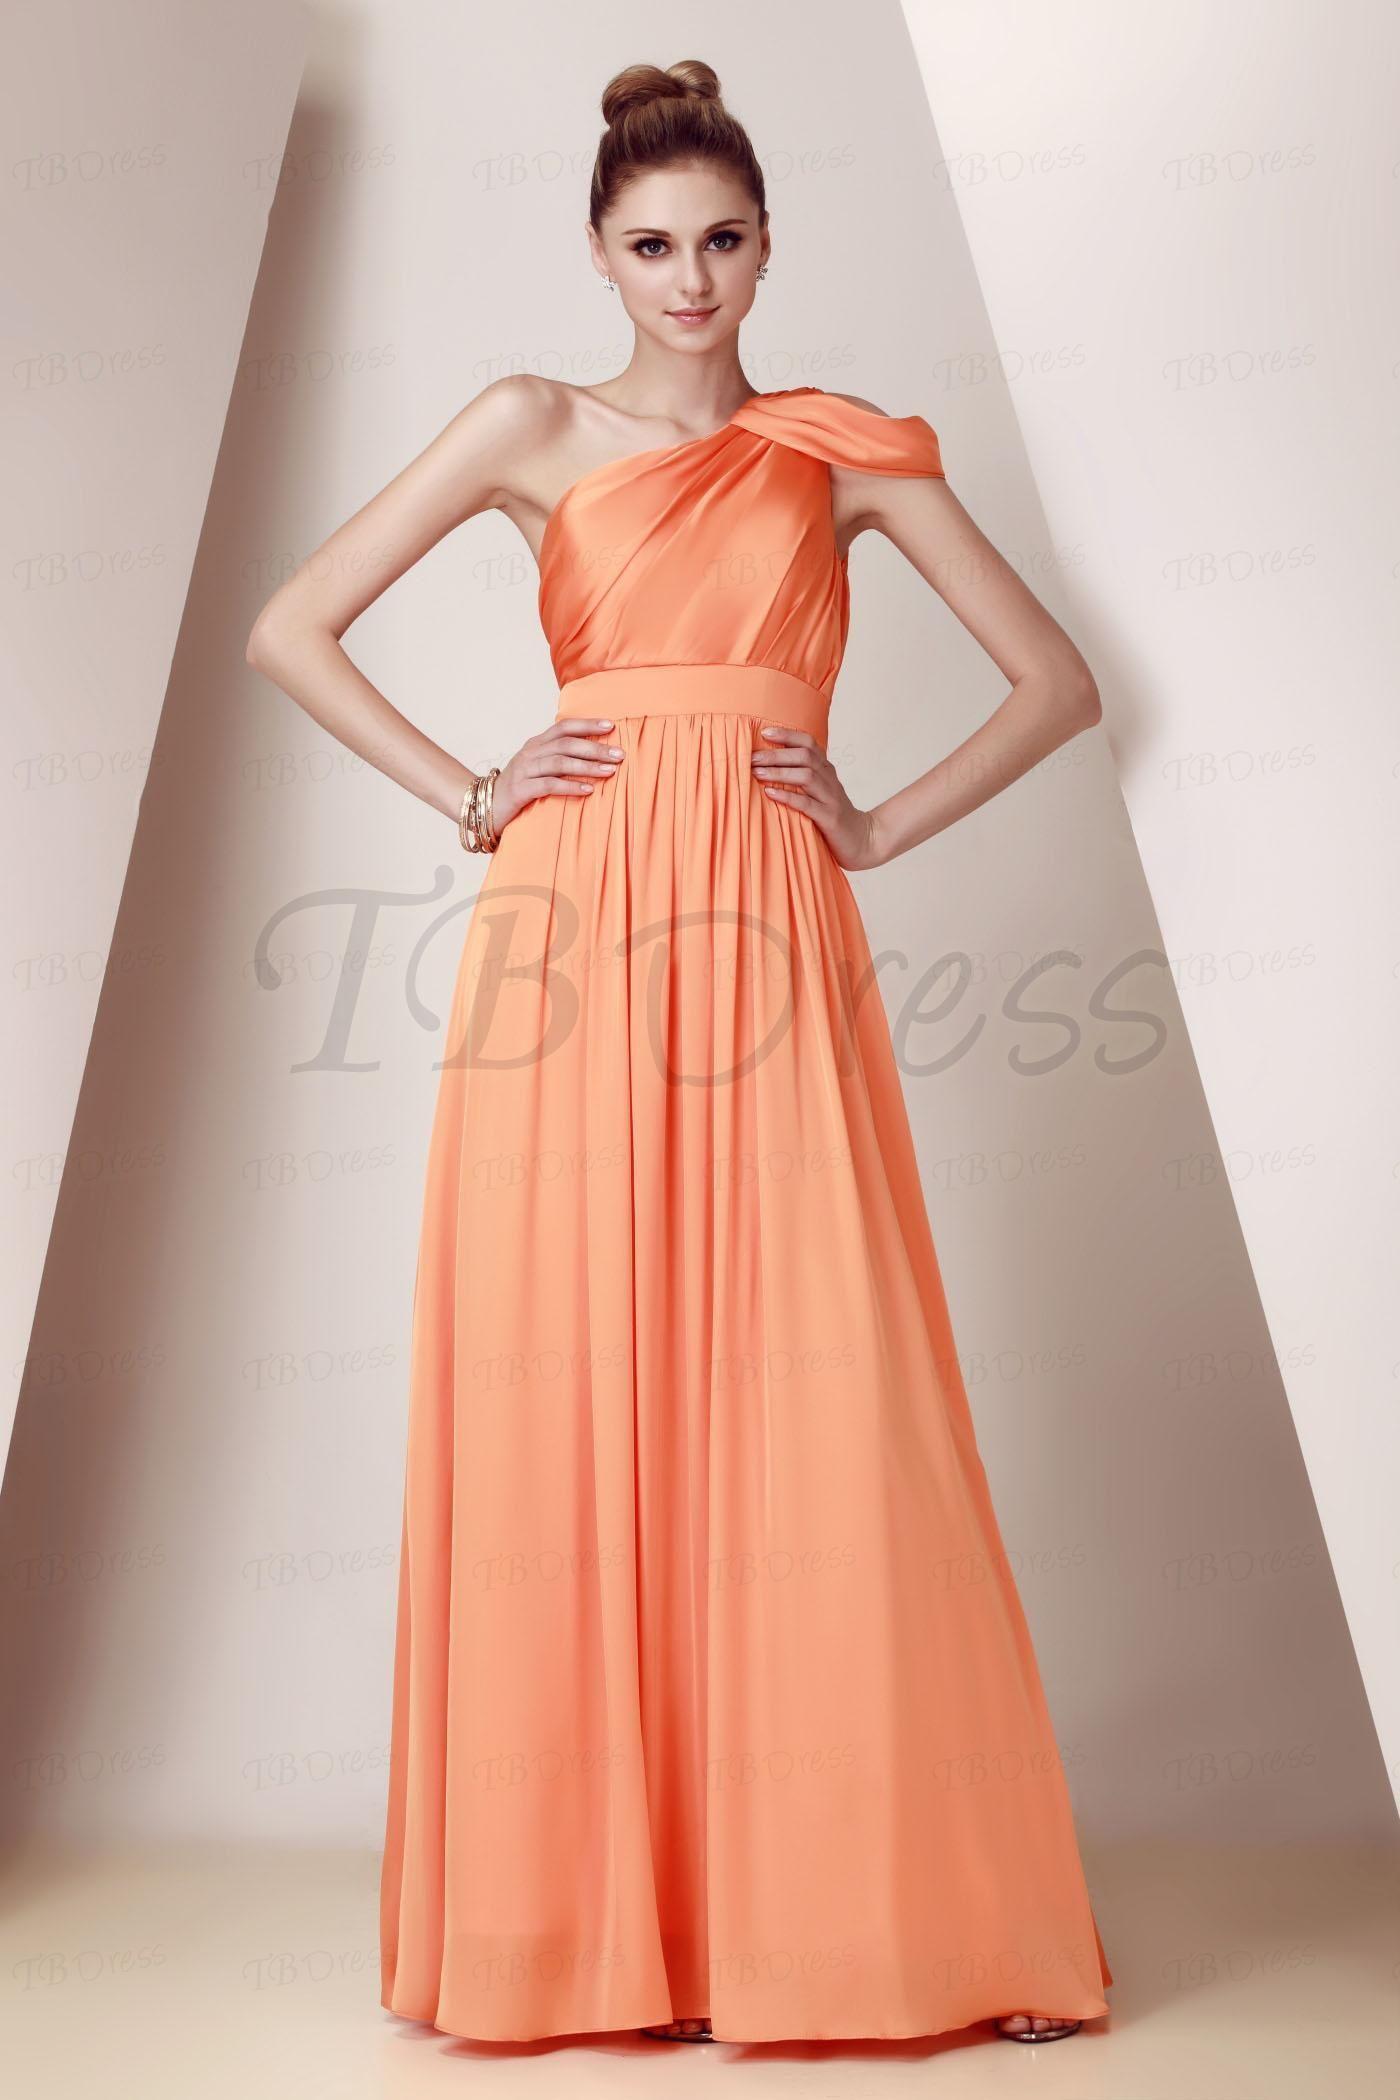 Discount Bridesmaid Dresses Orange County - Bridesmaid Dresses US